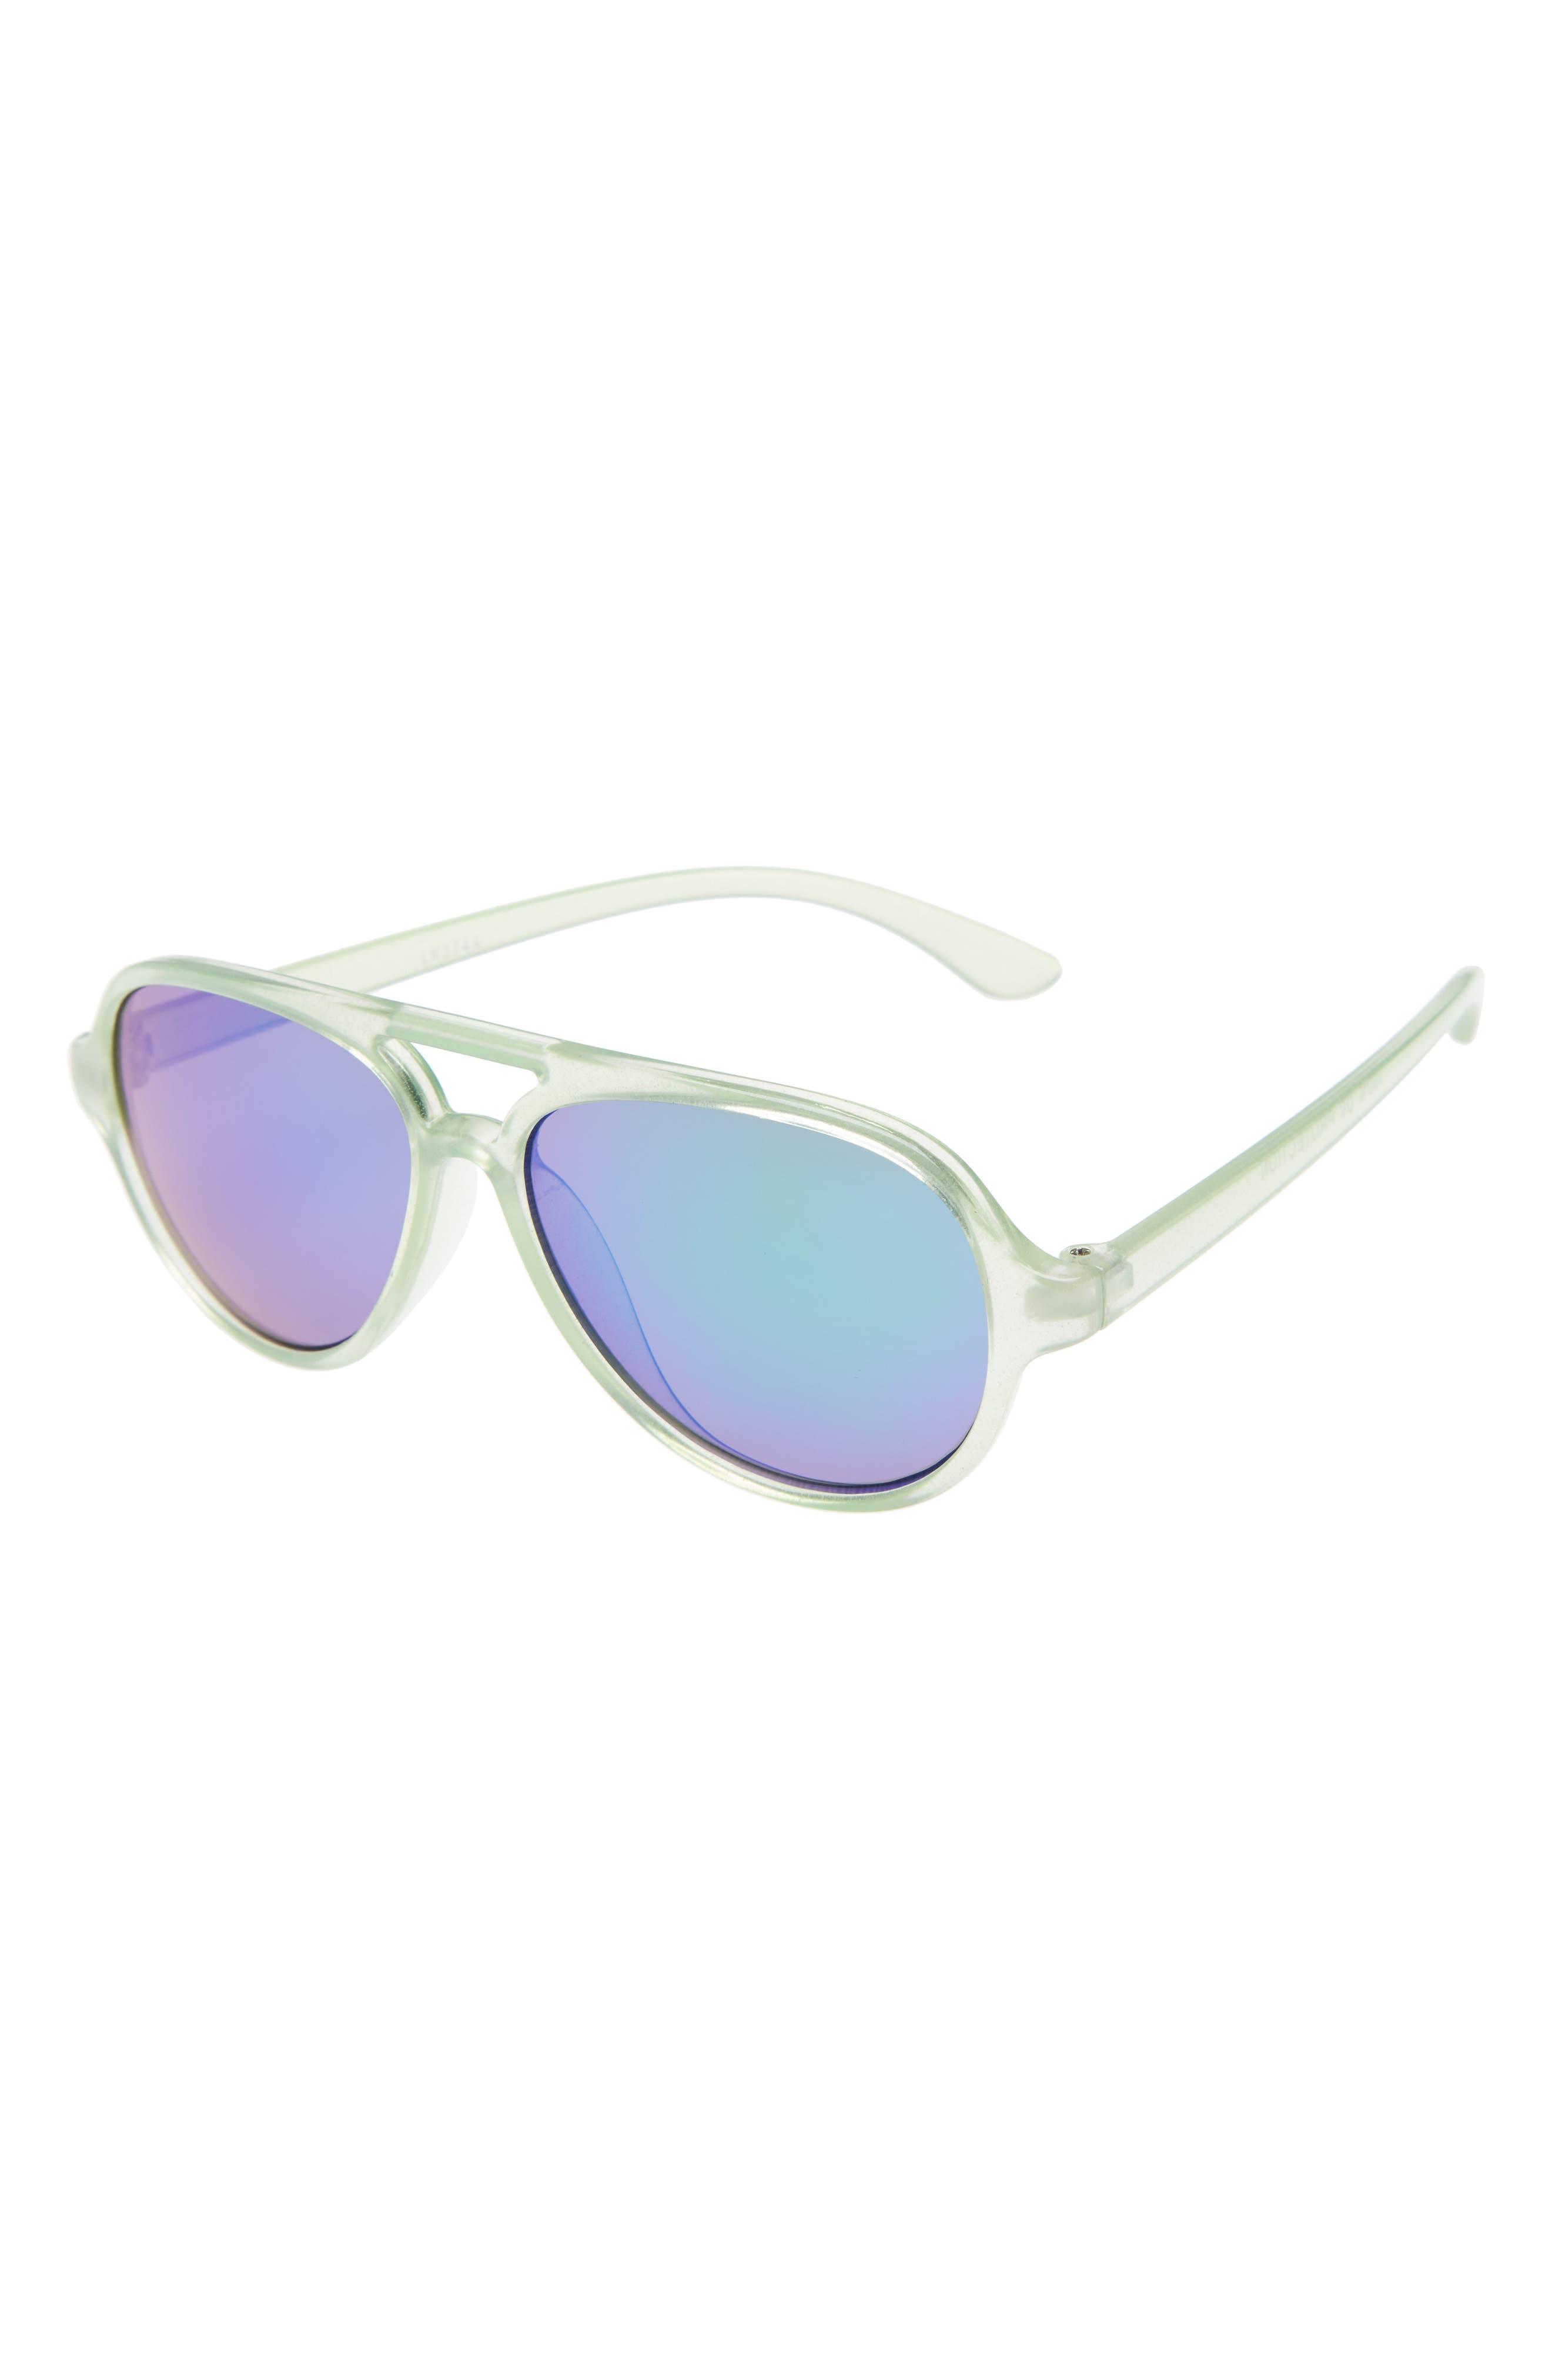 LOOSE LEAF EYEWEAR Carrera Glow in the Dark Sunglasses